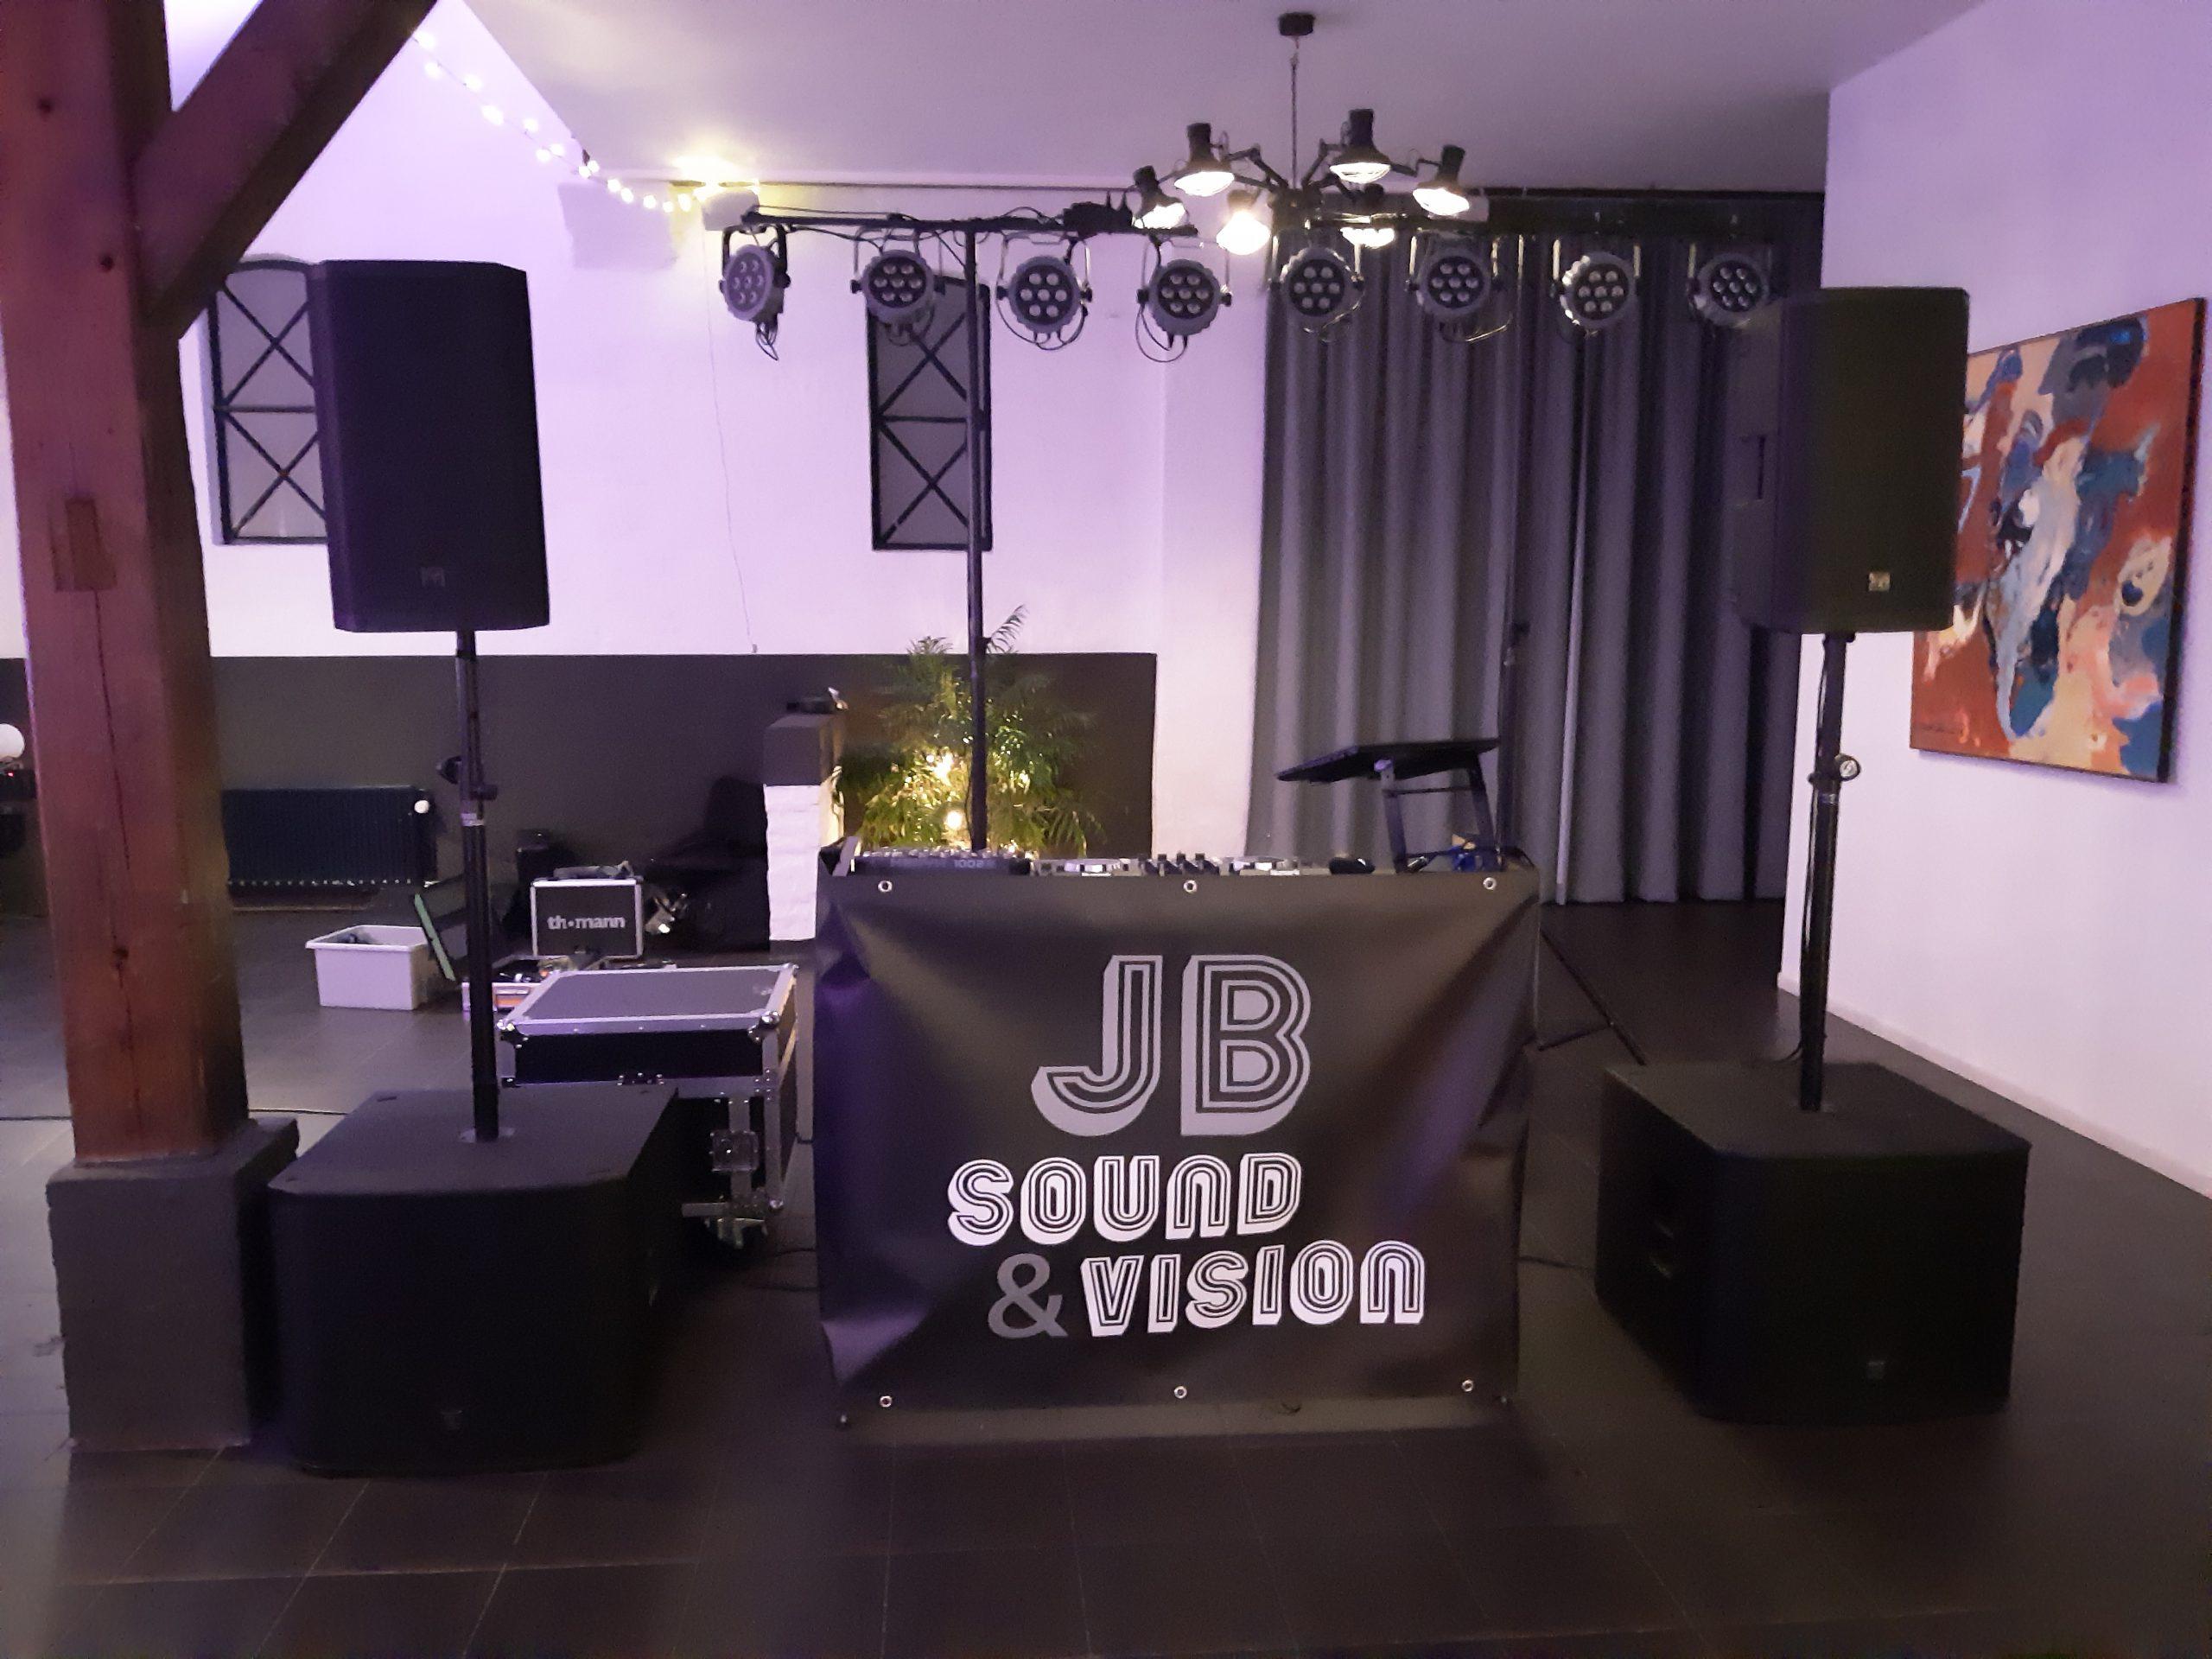 Bruiloft DJ huren Dalfsen